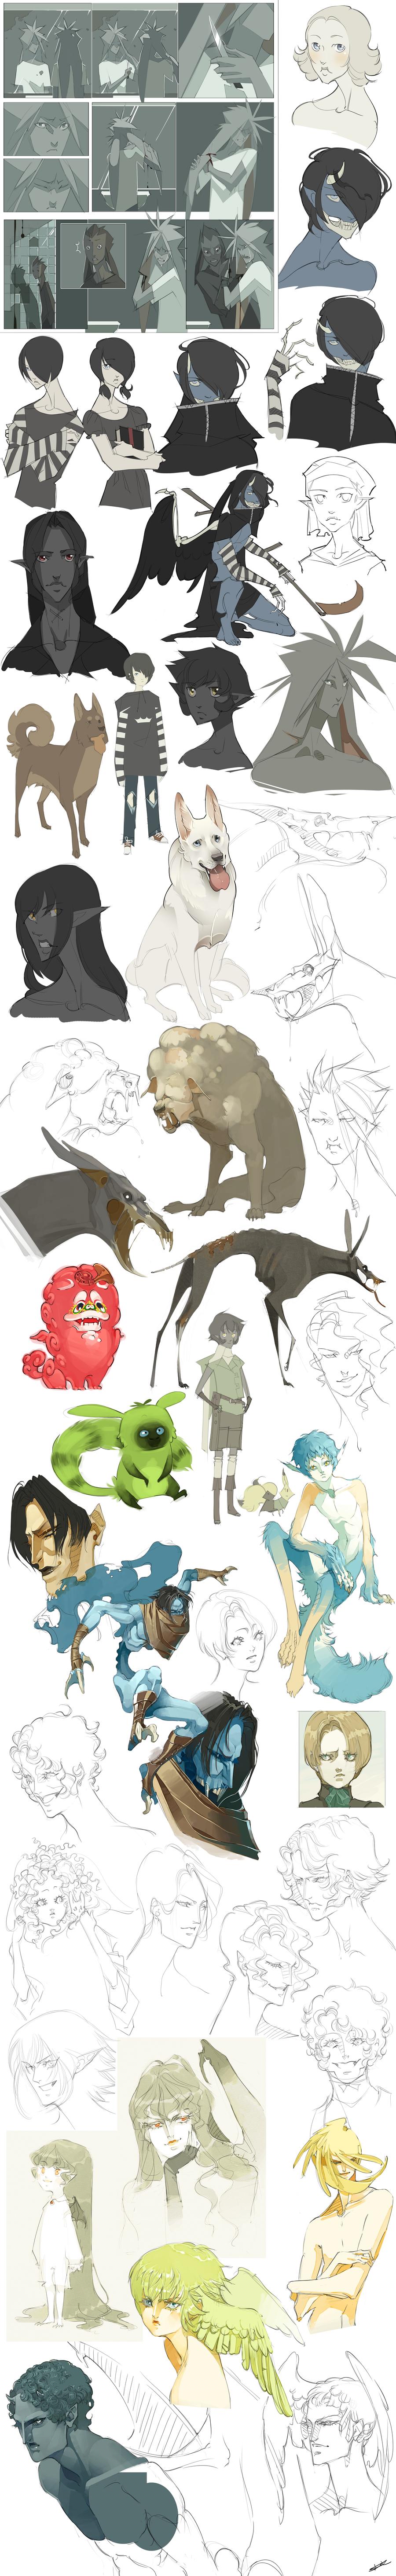 Sketch Dump by WhiteFoxCub